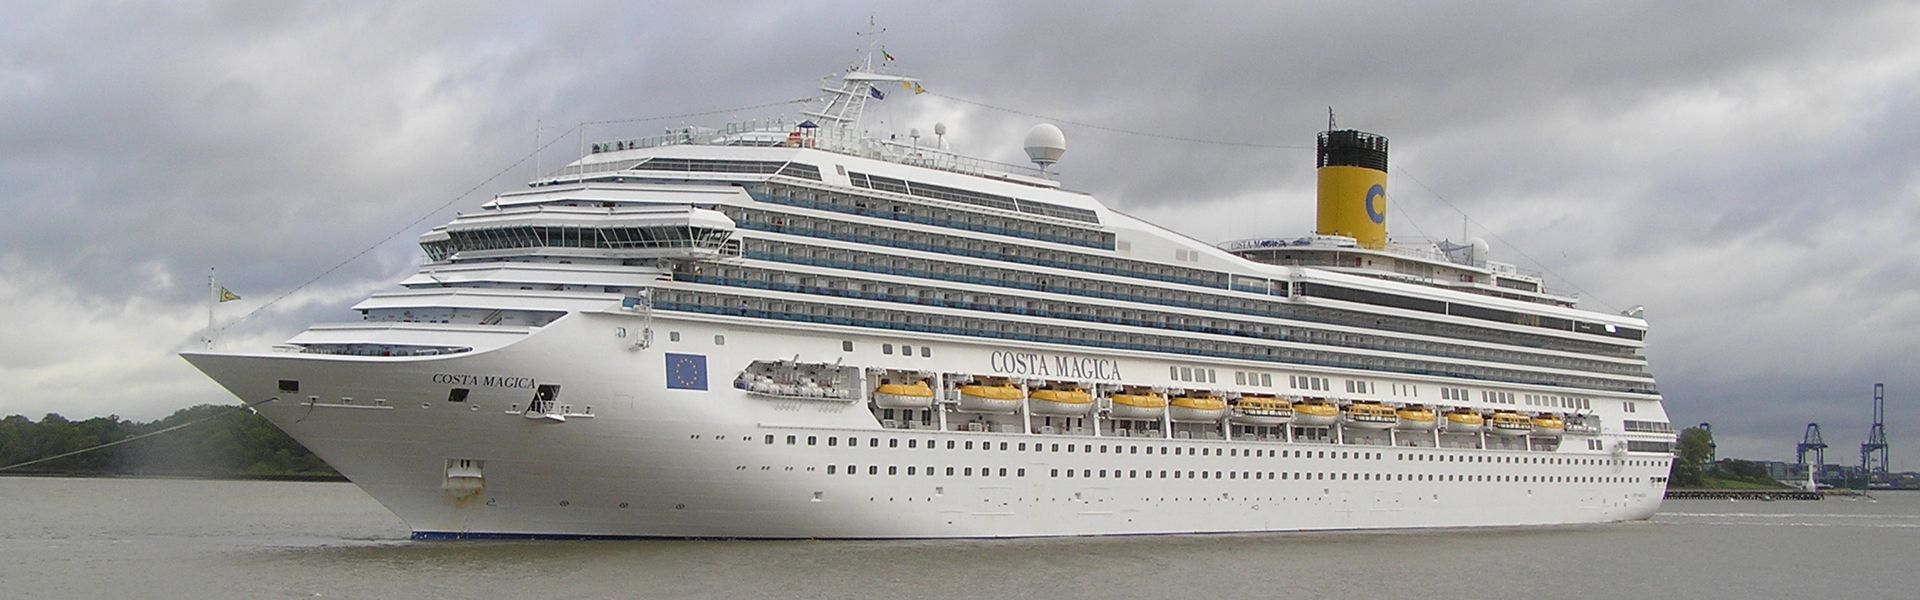 Croaziera 2017 - Transatlantic si Repozitionari (Buenos Aires) - Costa Cruises - Costa Pacifica - 25 nopti